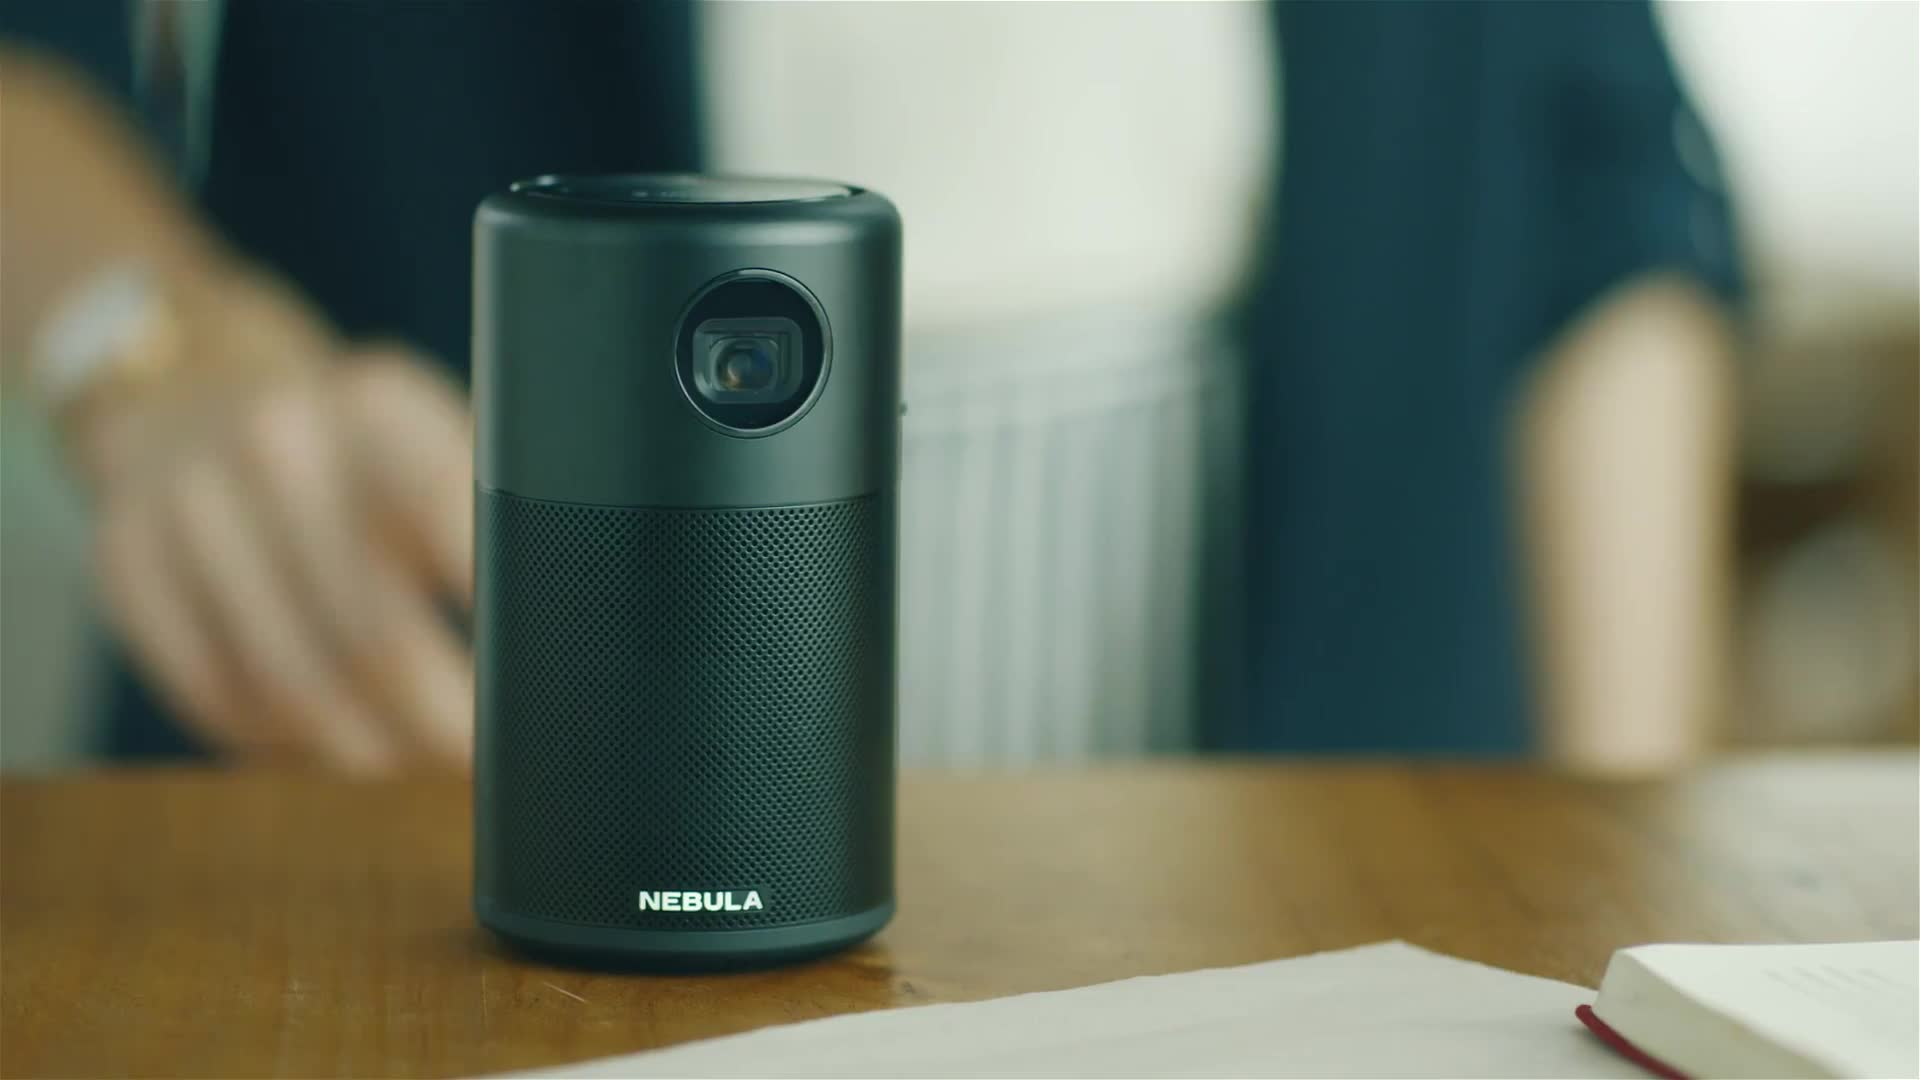 nebula, pico projector, projector, Nebula Capsule Commercial TVC GIFs